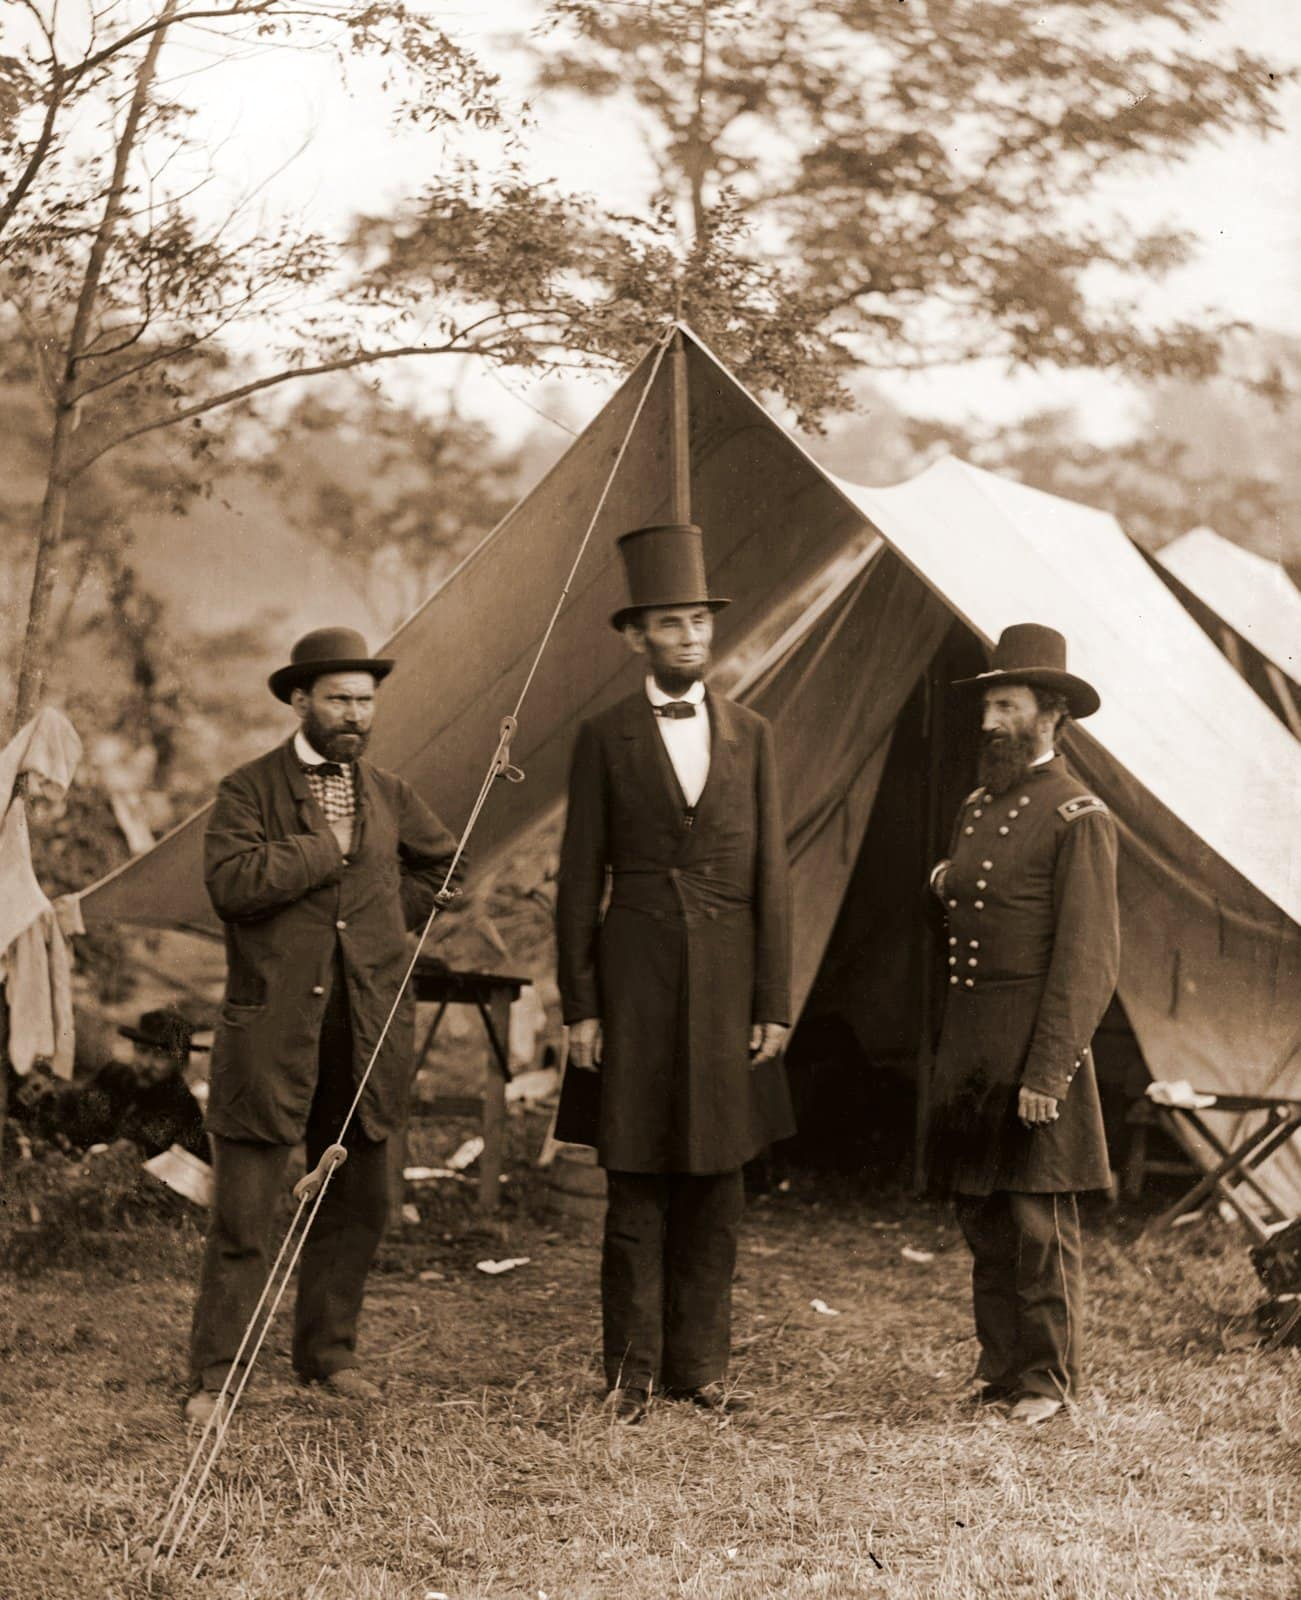 Allan Pinkerton, President Lincoln, and Maj. Gen. John A. McClernand - Civil War Battle of Antietam (1962)